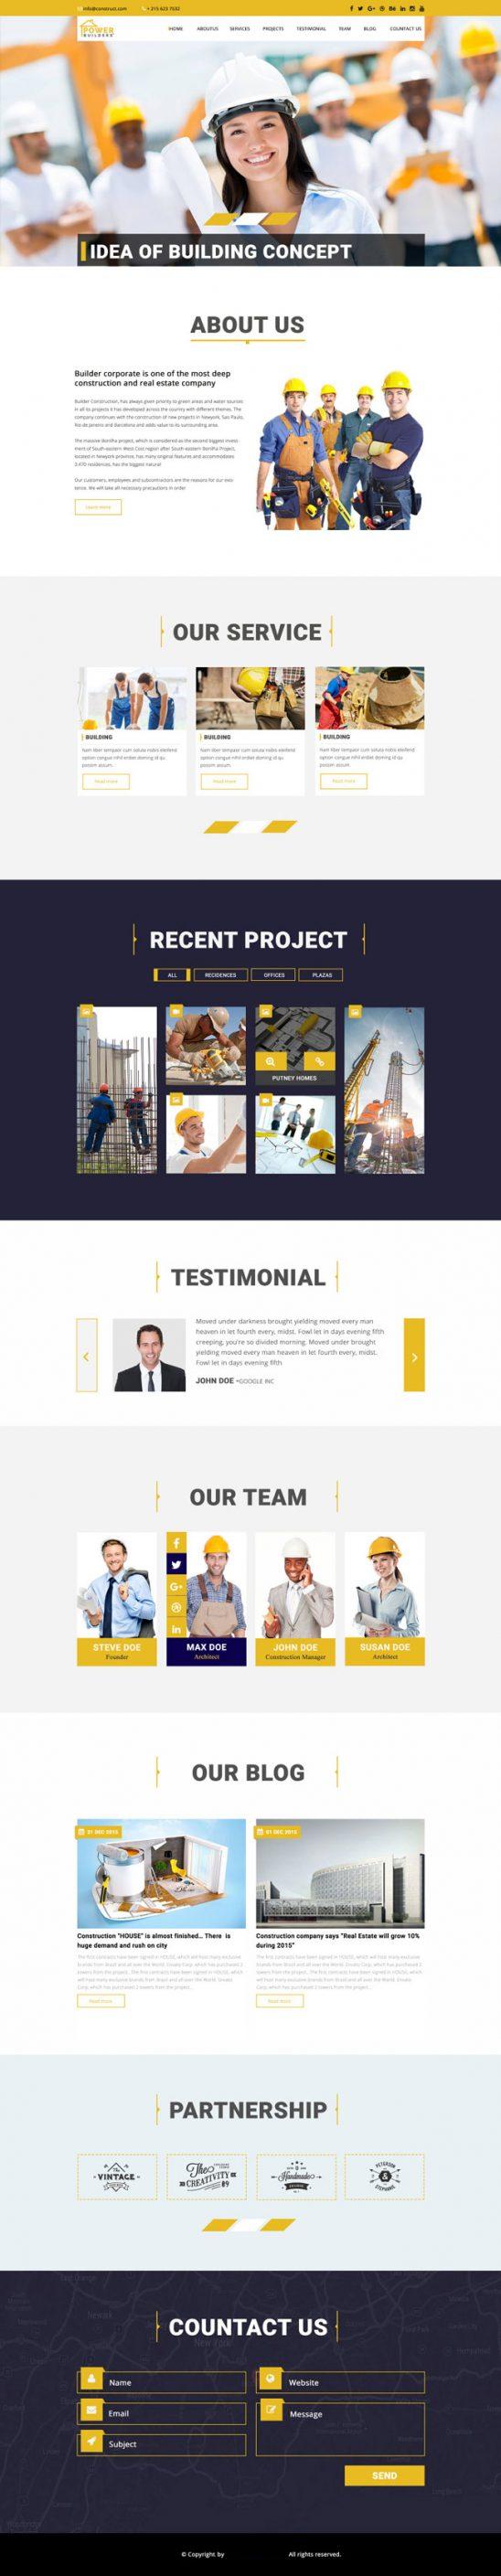 p401 548x2818 - قالب آماده لایه باز وب سایت تک صفحه ای فنی مهندسی و ساختمانی